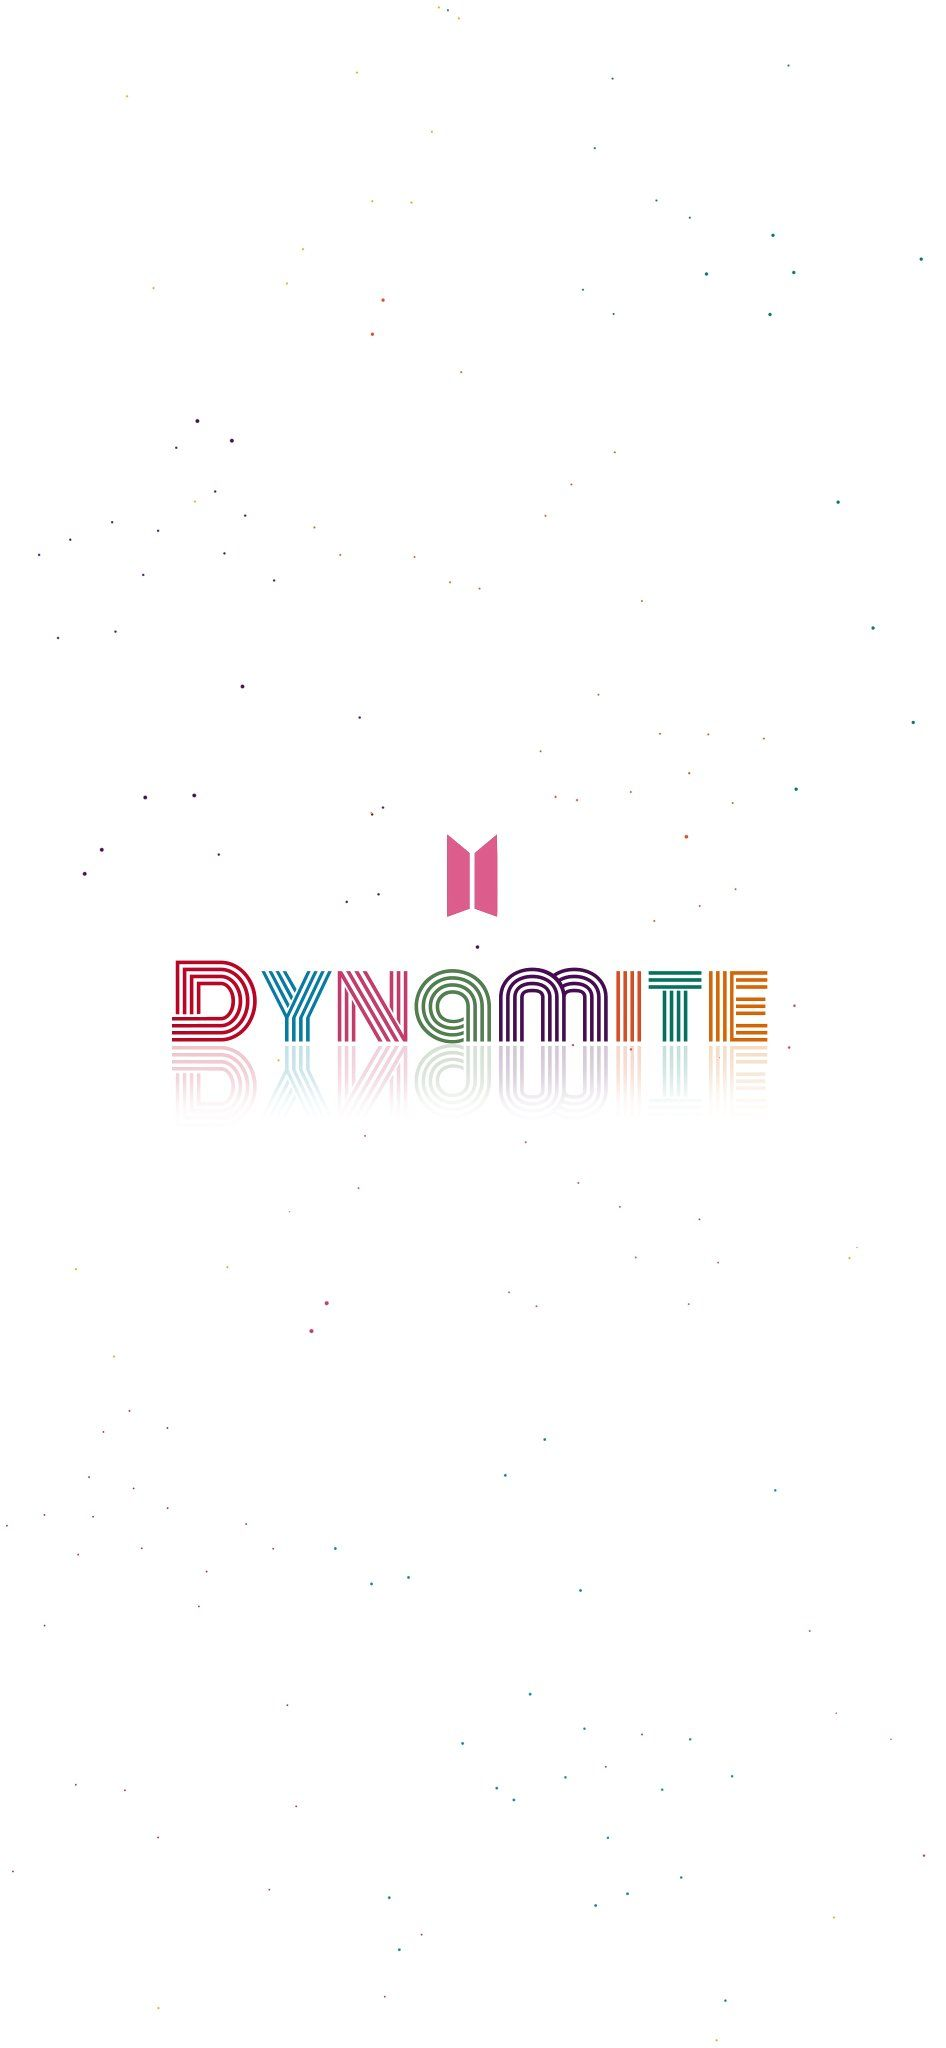 Bts Dynamite Wallpaper Lockscreen Edit Kartu Bts Suga Bts Bts dynamite logo wallpaper